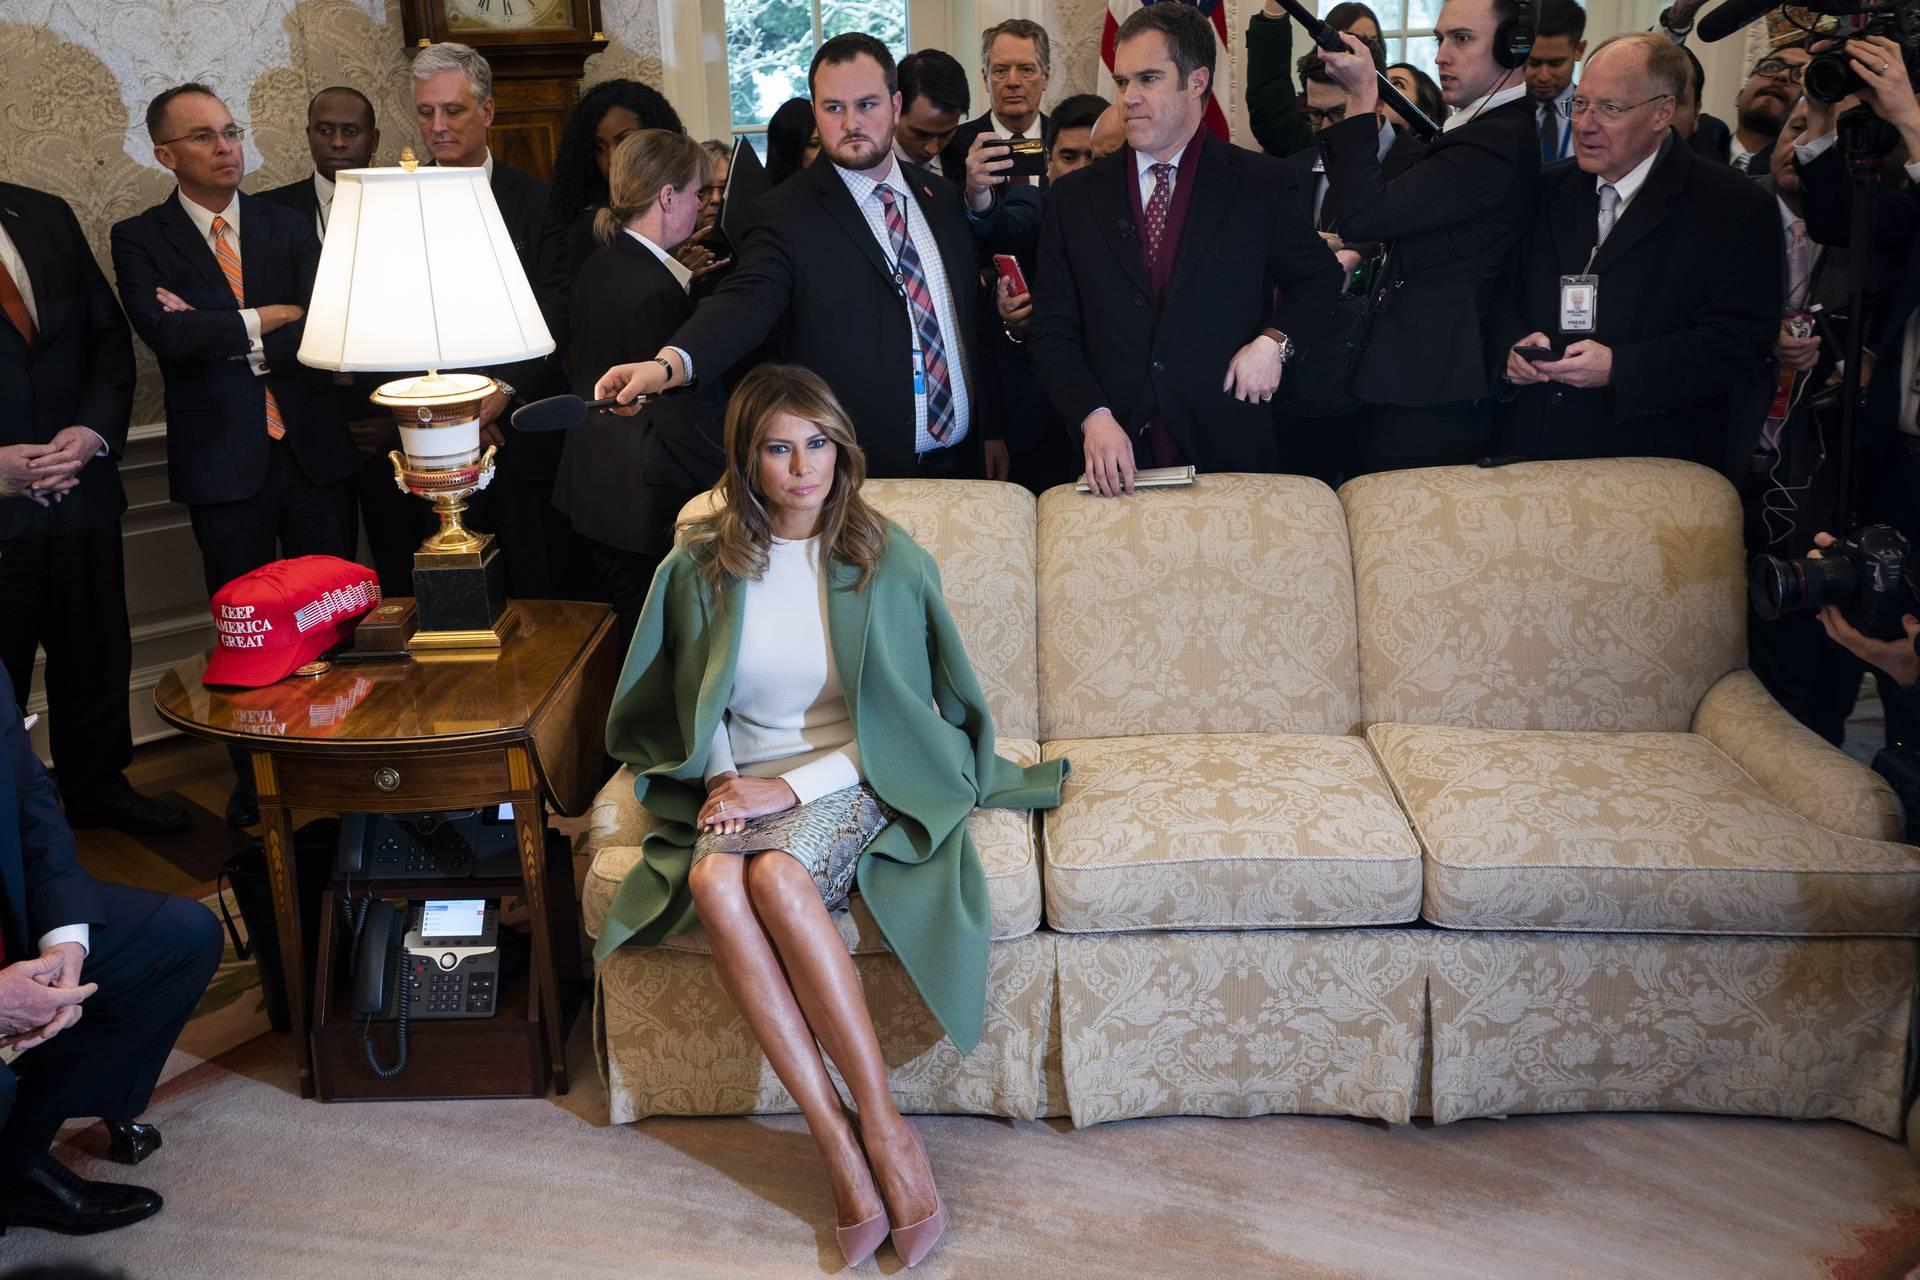 Lenin Moreno visits President Trump at White House